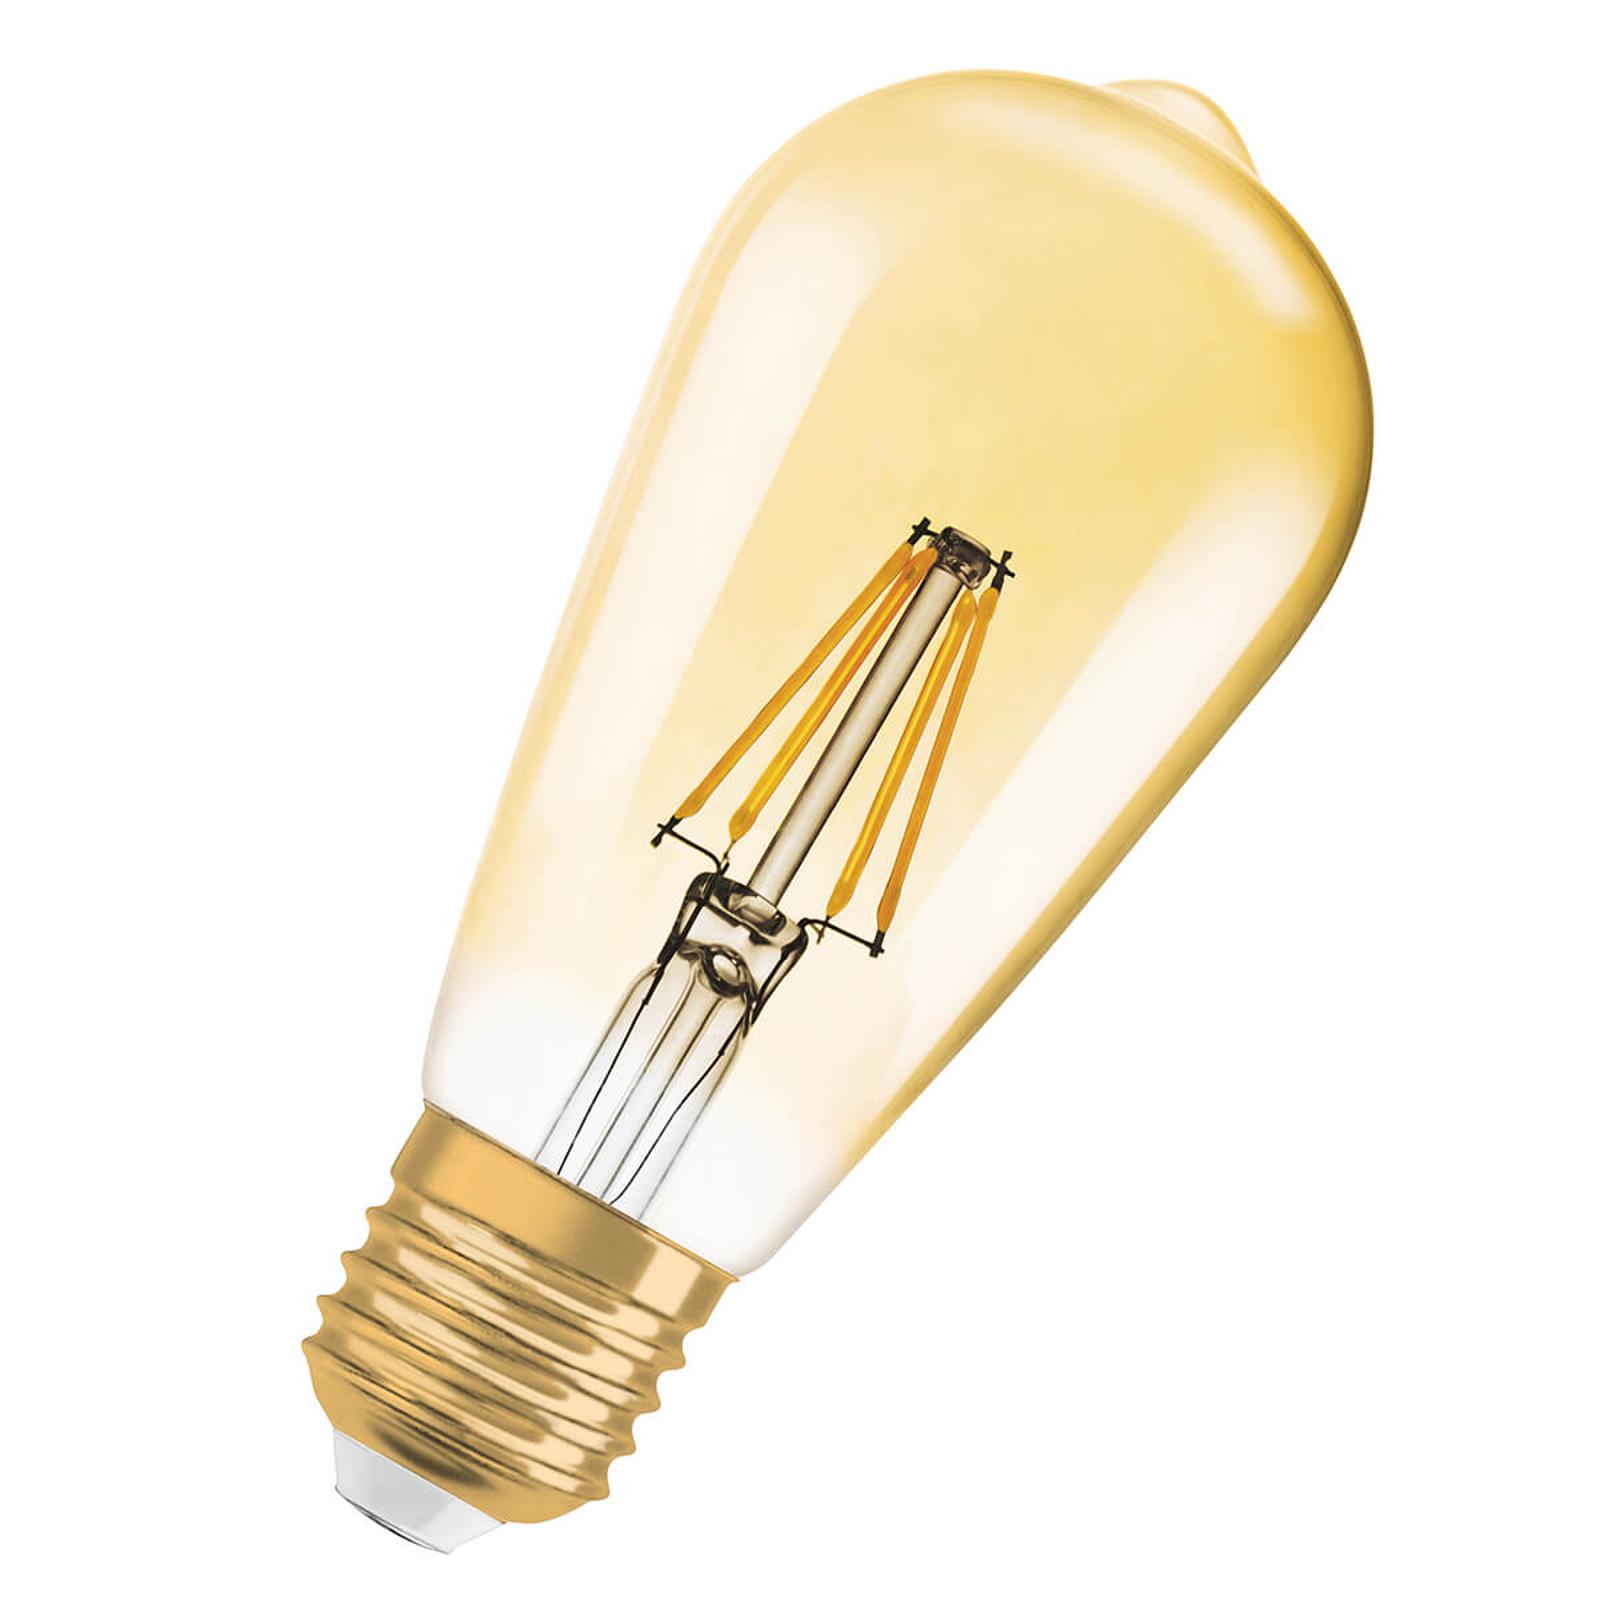 Lampadina LED Gold E27 2,5W bianco caldo 225 lumen